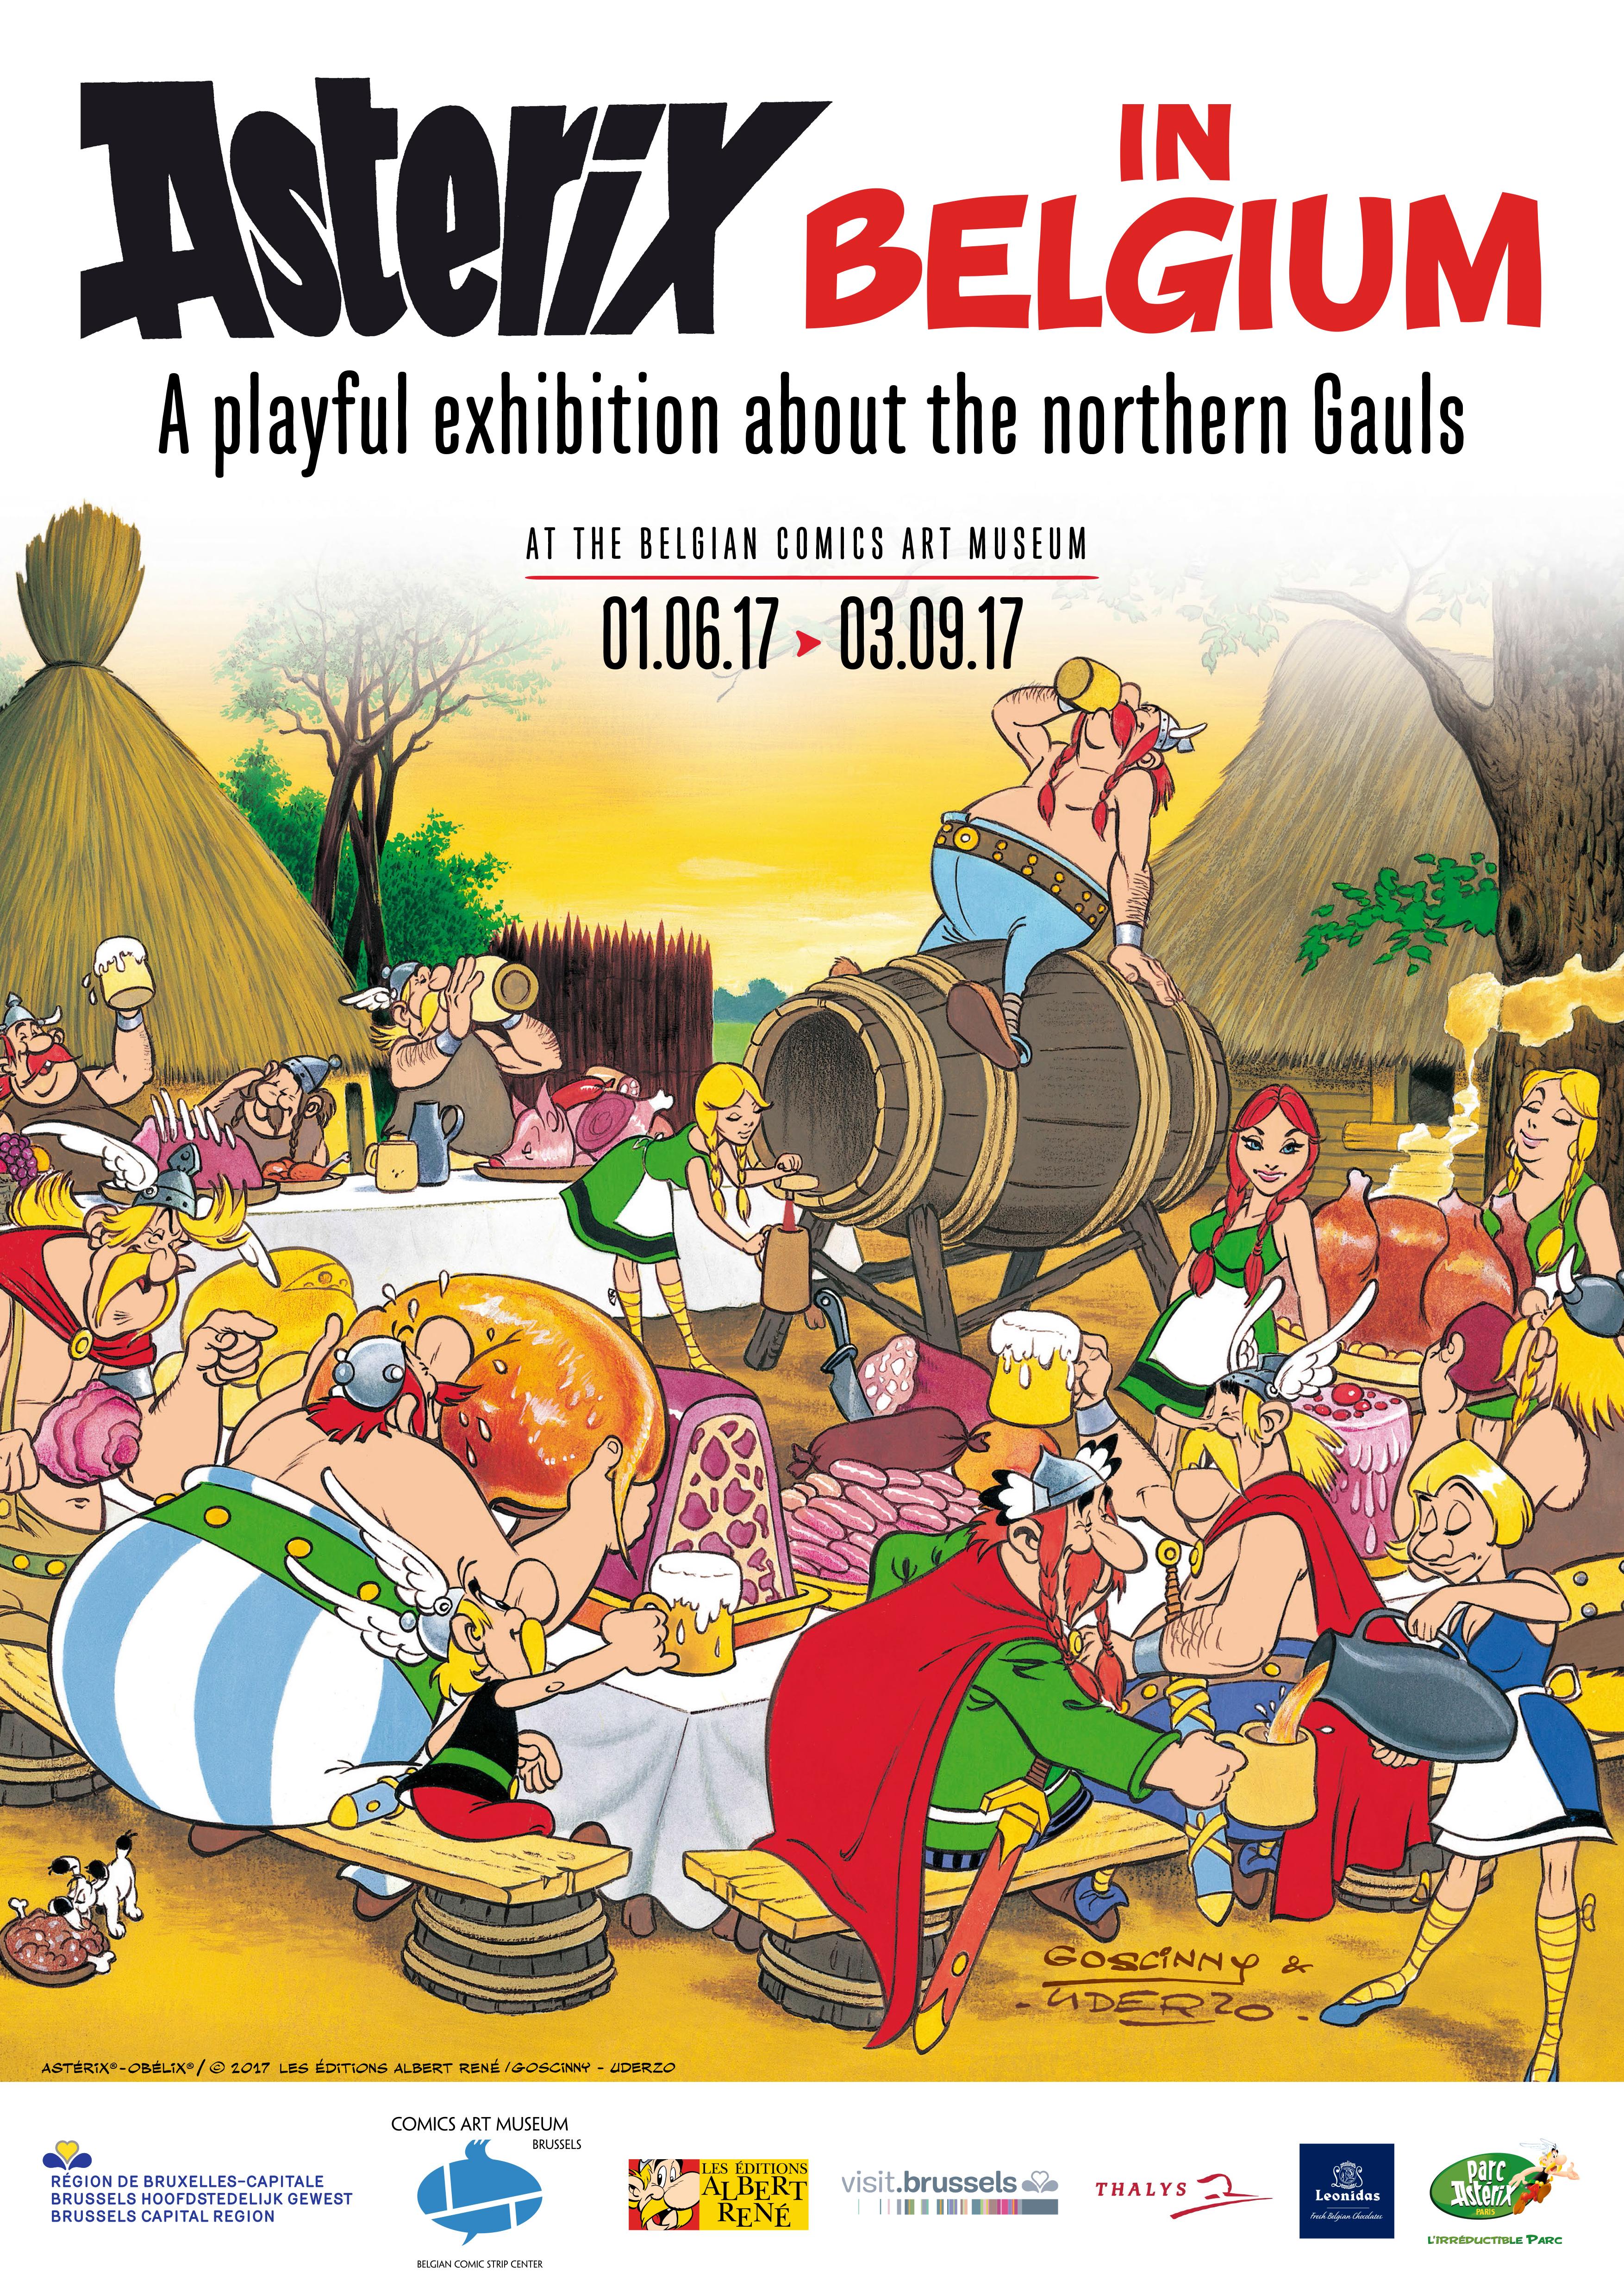 The great temporary exhibitions asterix in belgium the belgian asterix in altavistaventures Gallery